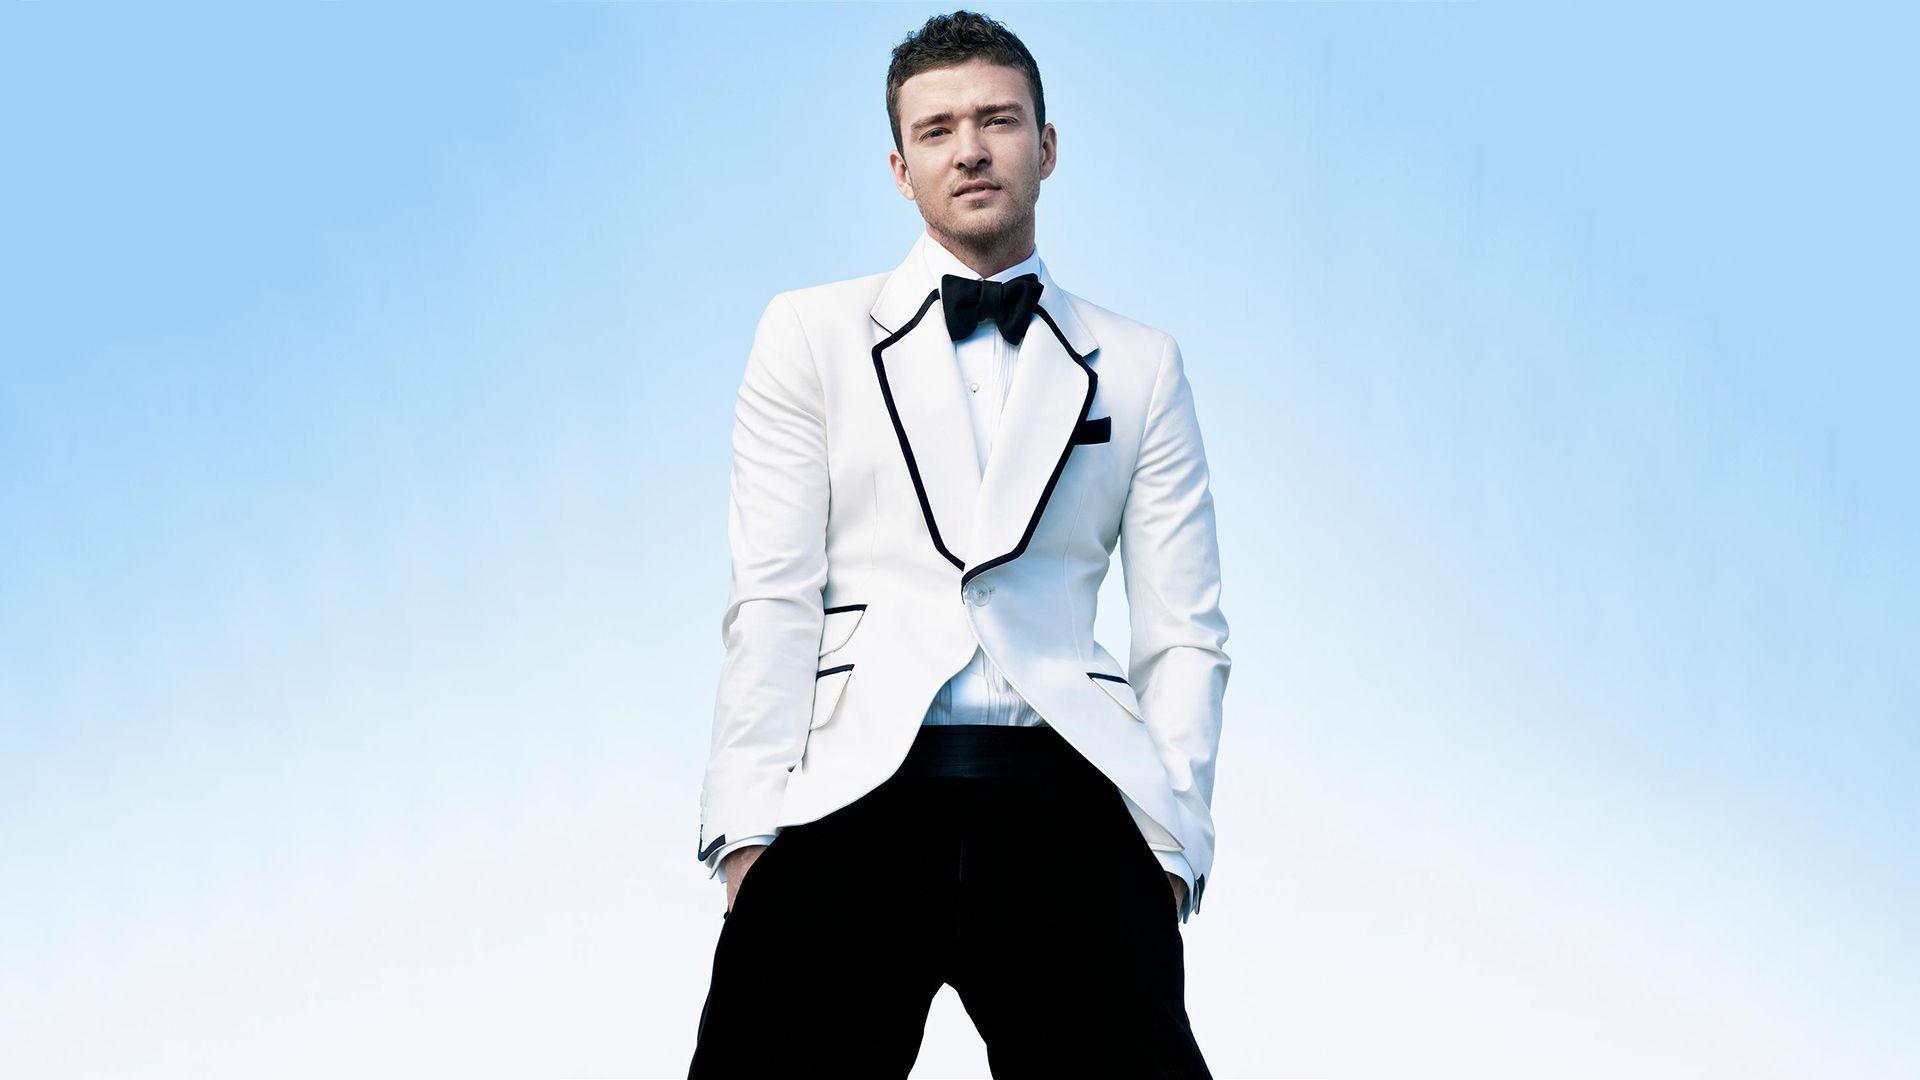 Justin Timberlake Wallpapers - Wallpaper Cave